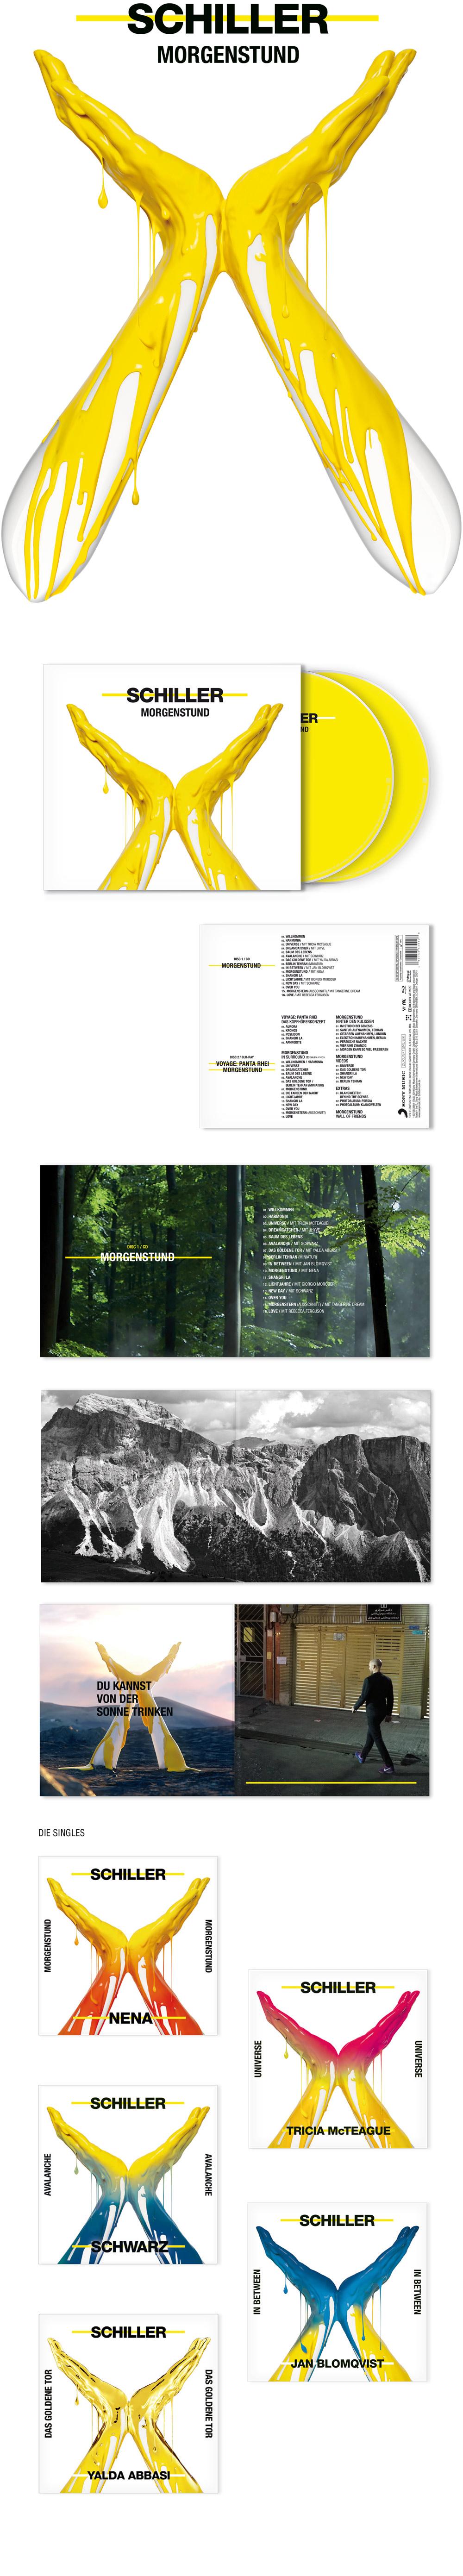 COEN Concept & Design Berlin - Schiller Morgenstund